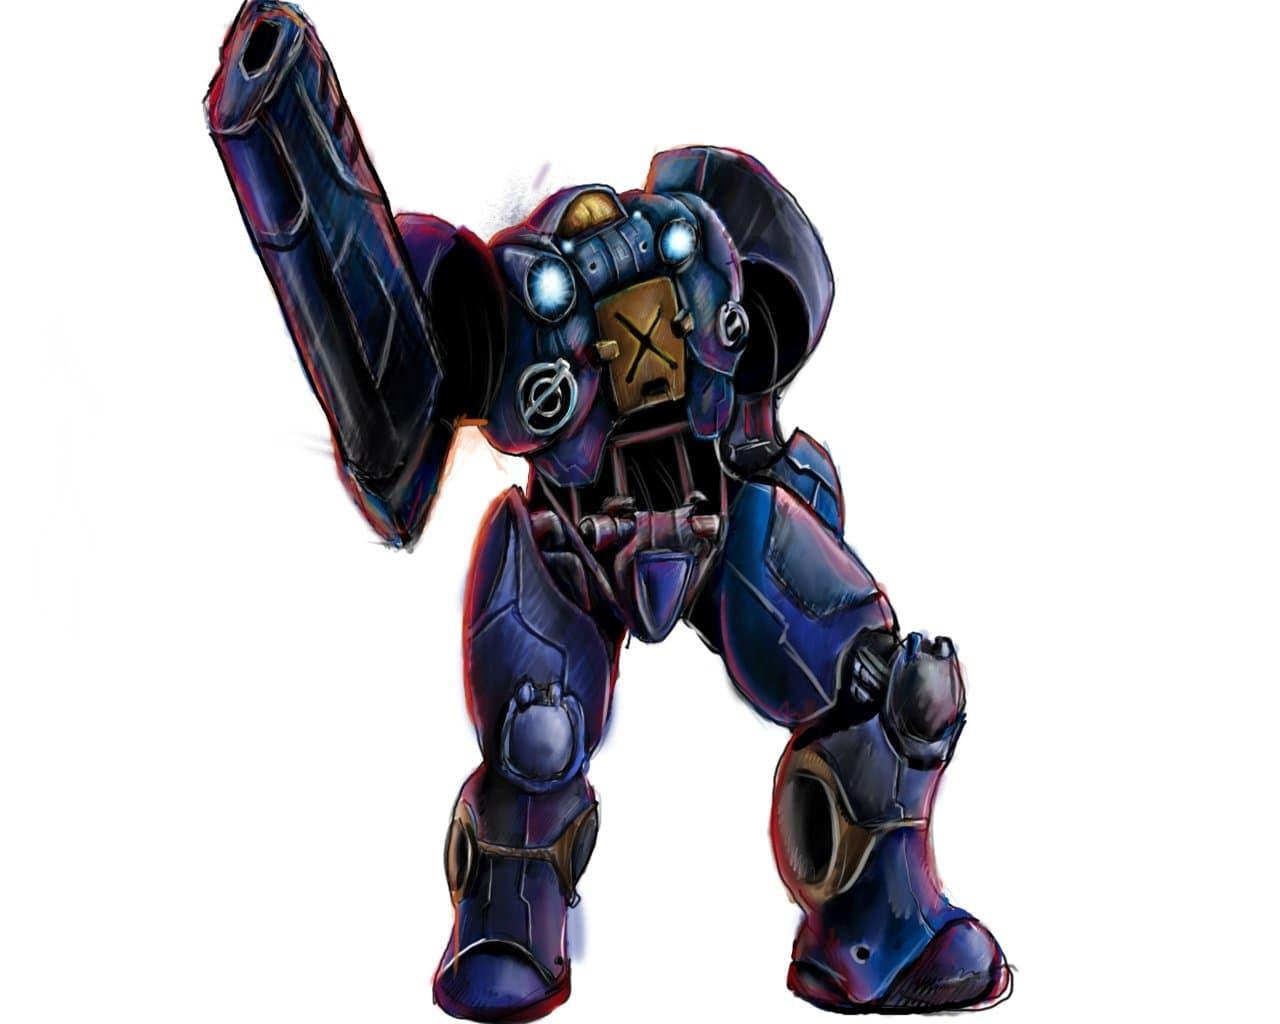 StarCyborg